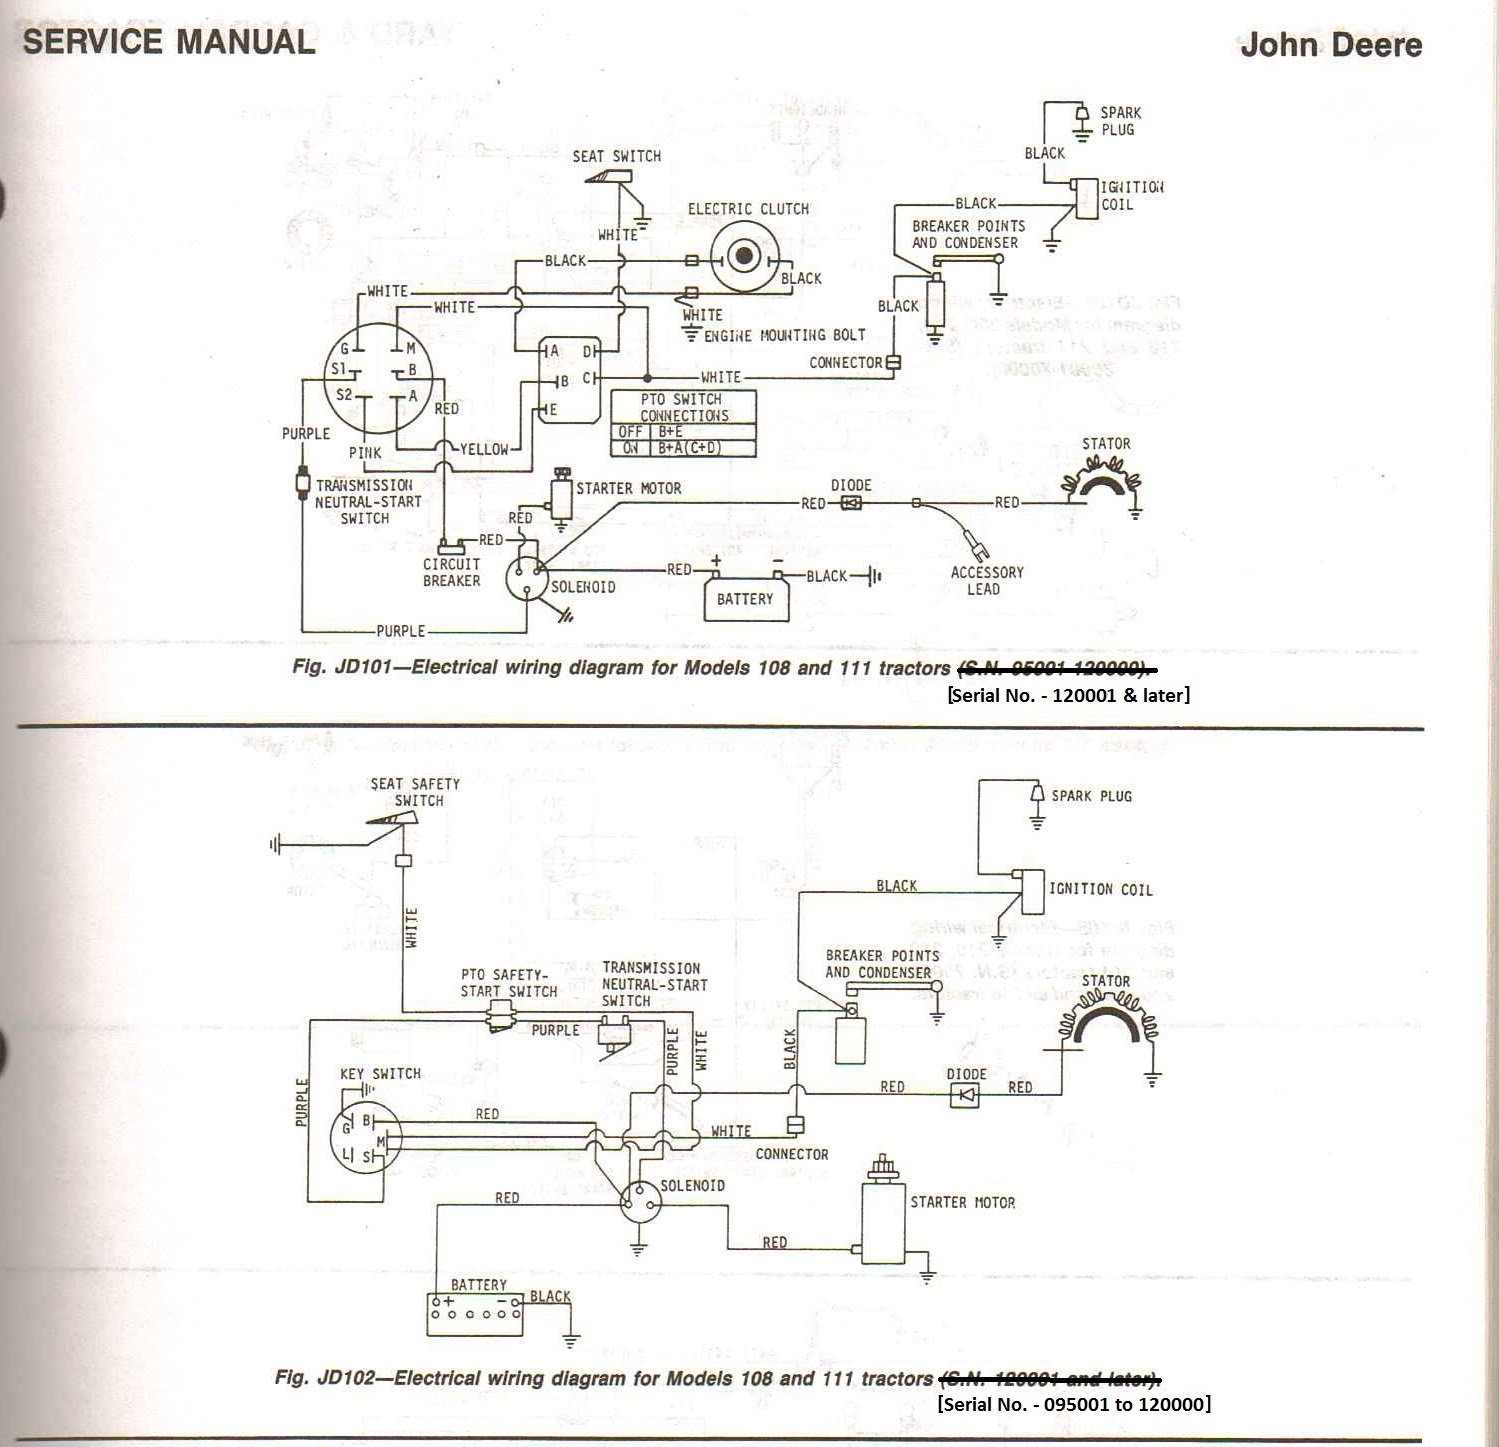 [DIAGRAM_3ER]  John Deere 111 Electrical Schematics | My Tractor Forum | 210c Wiring Diagram |  | My Tractor Forum